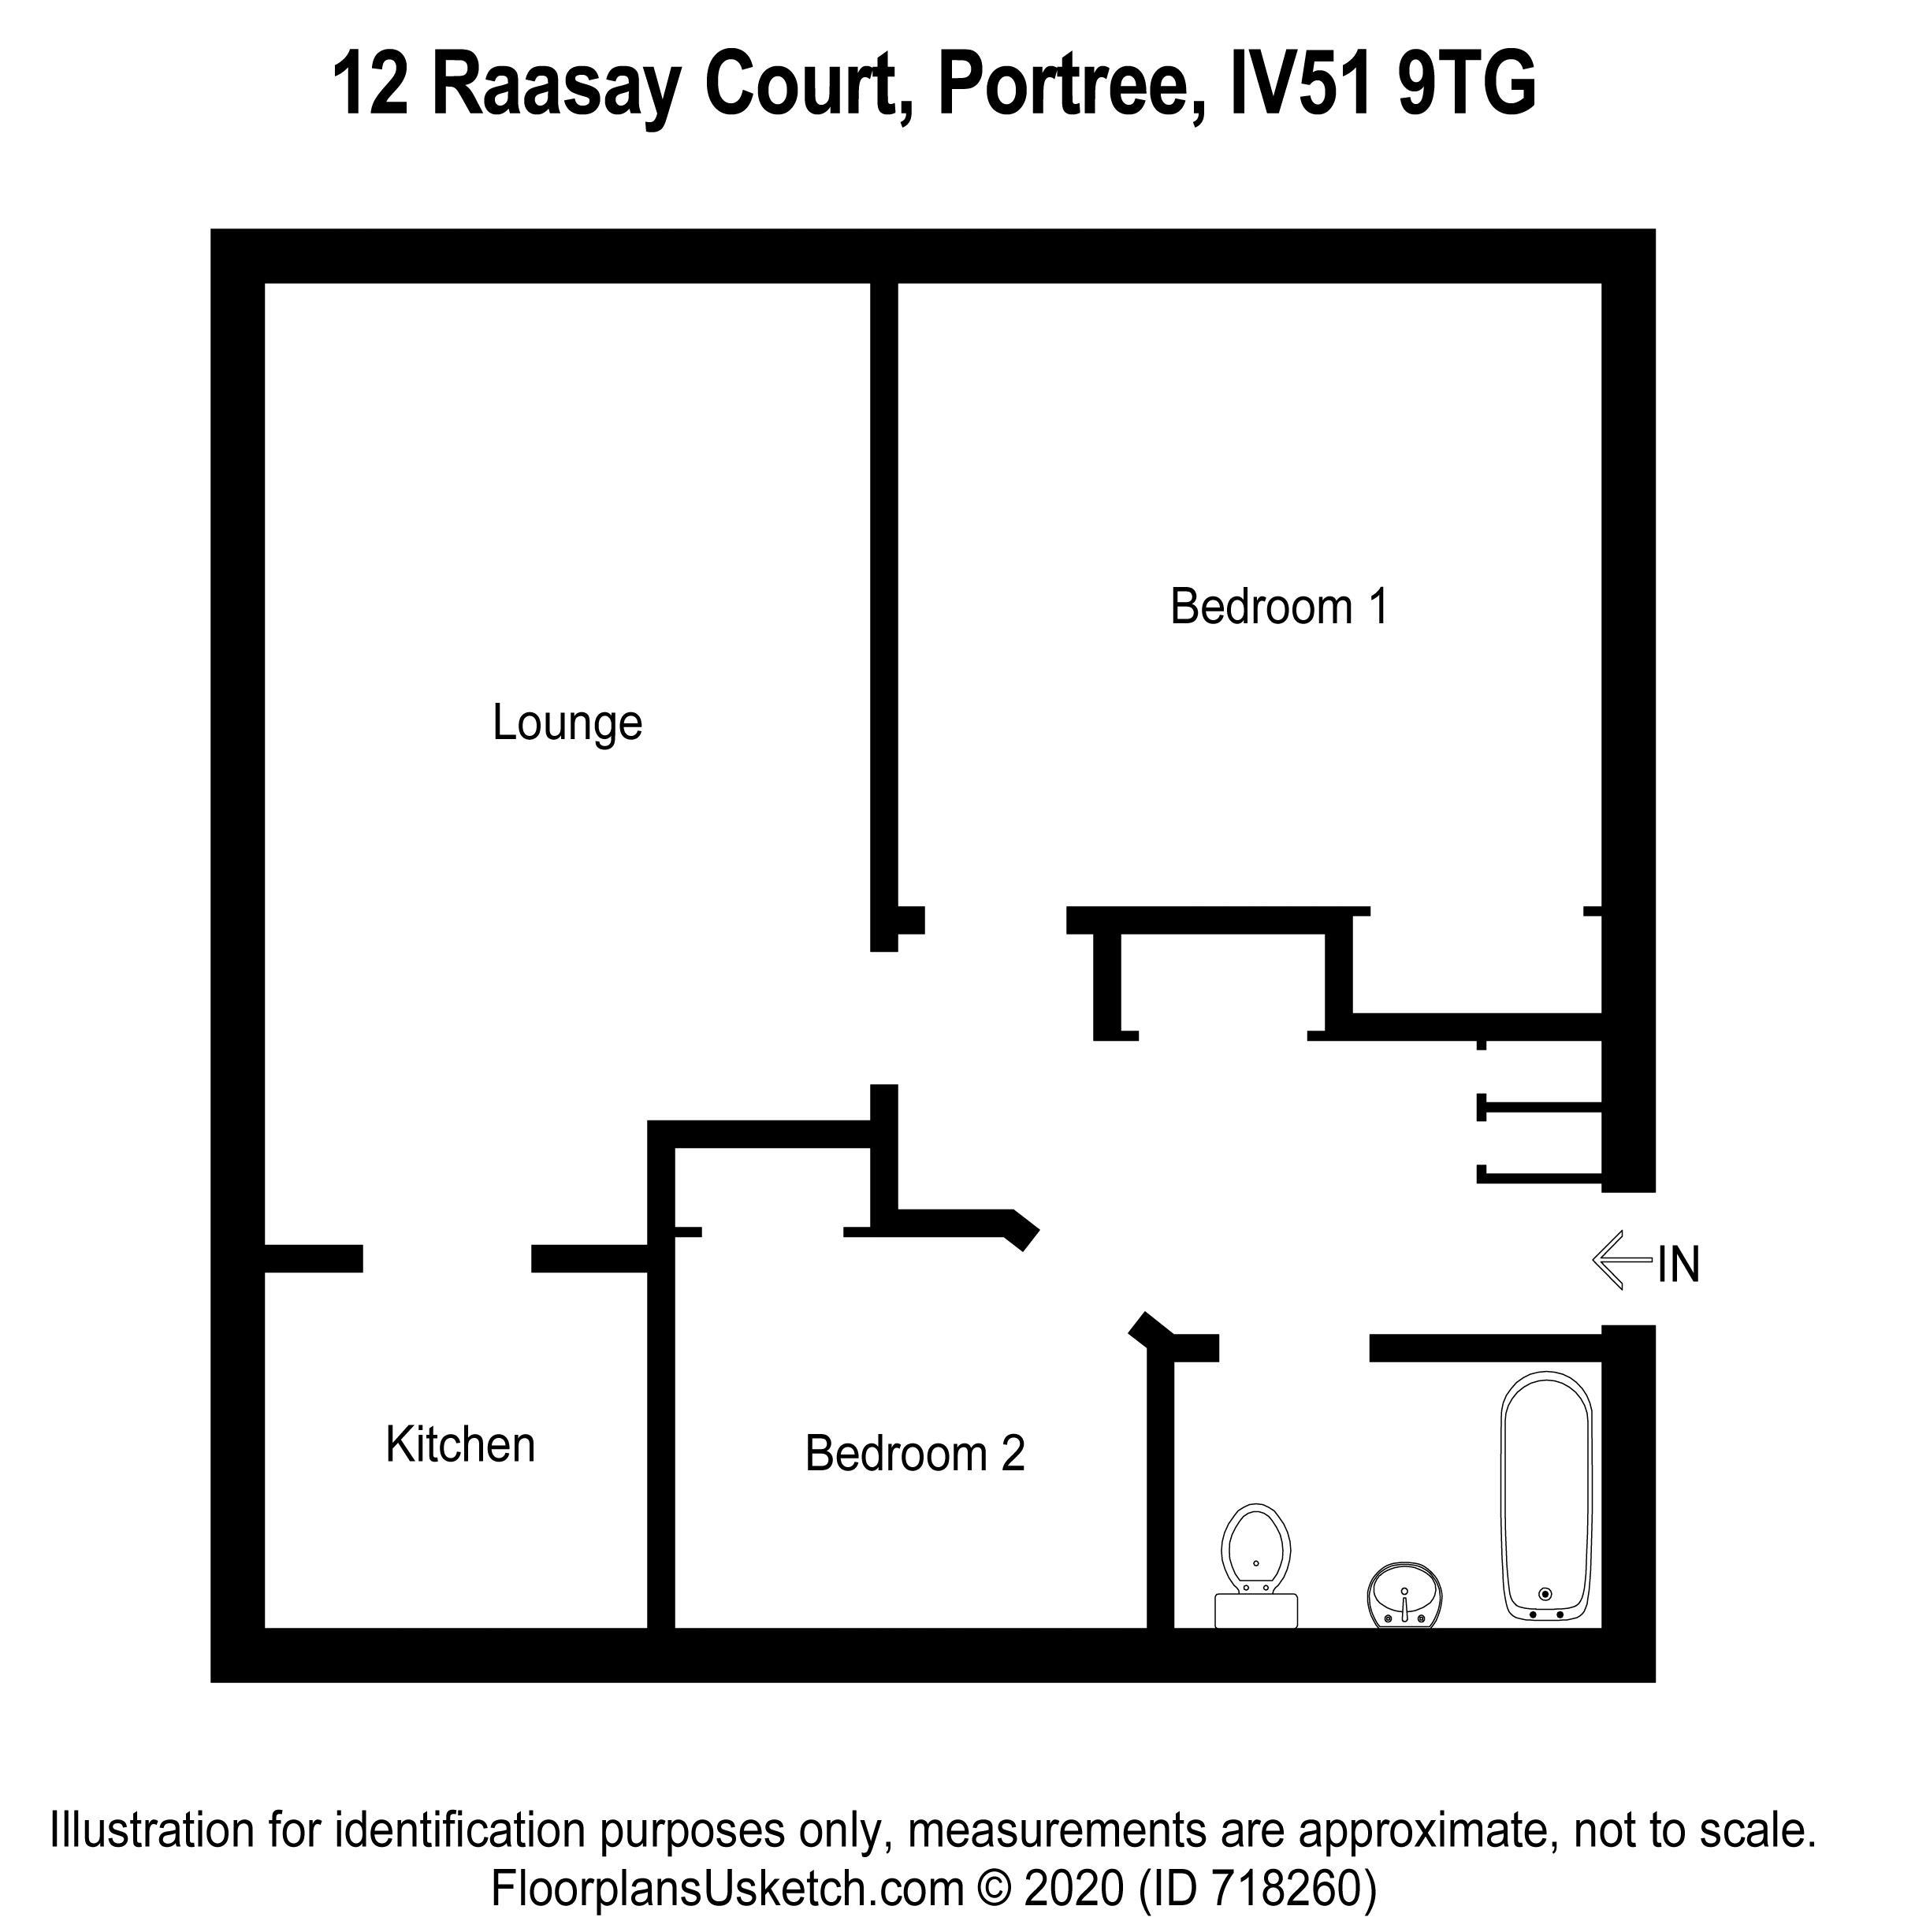 12 Rassay Court